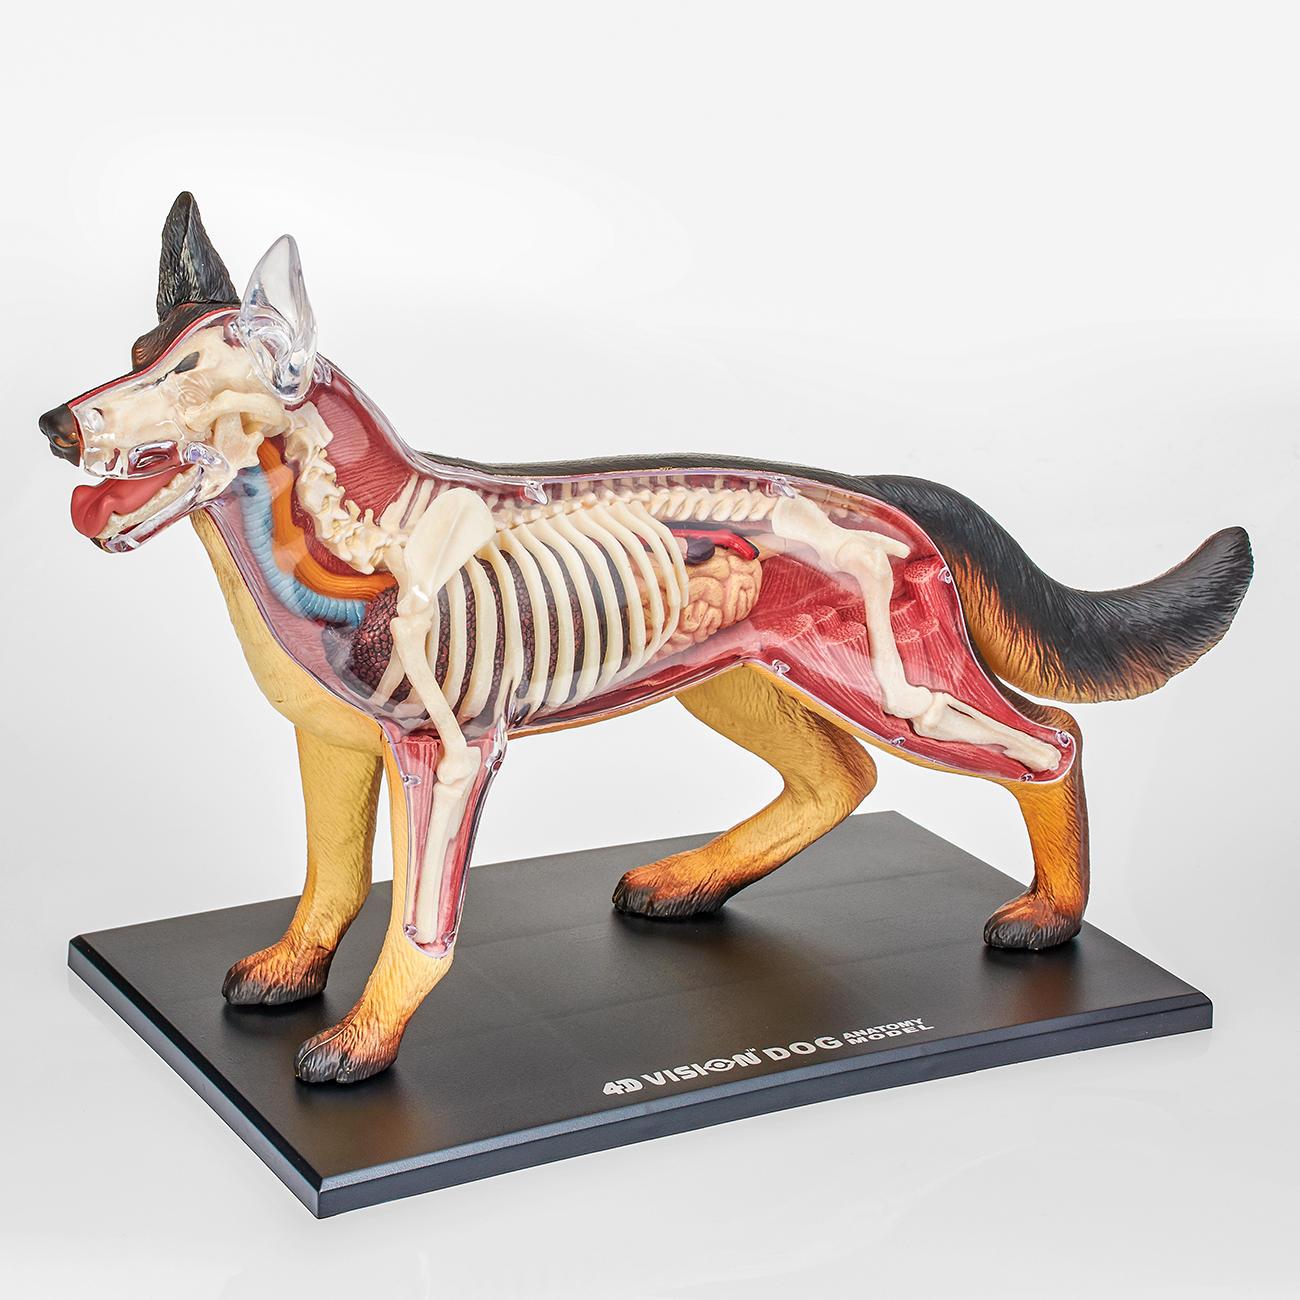 3D-Anatomie-Puzzle - Hund